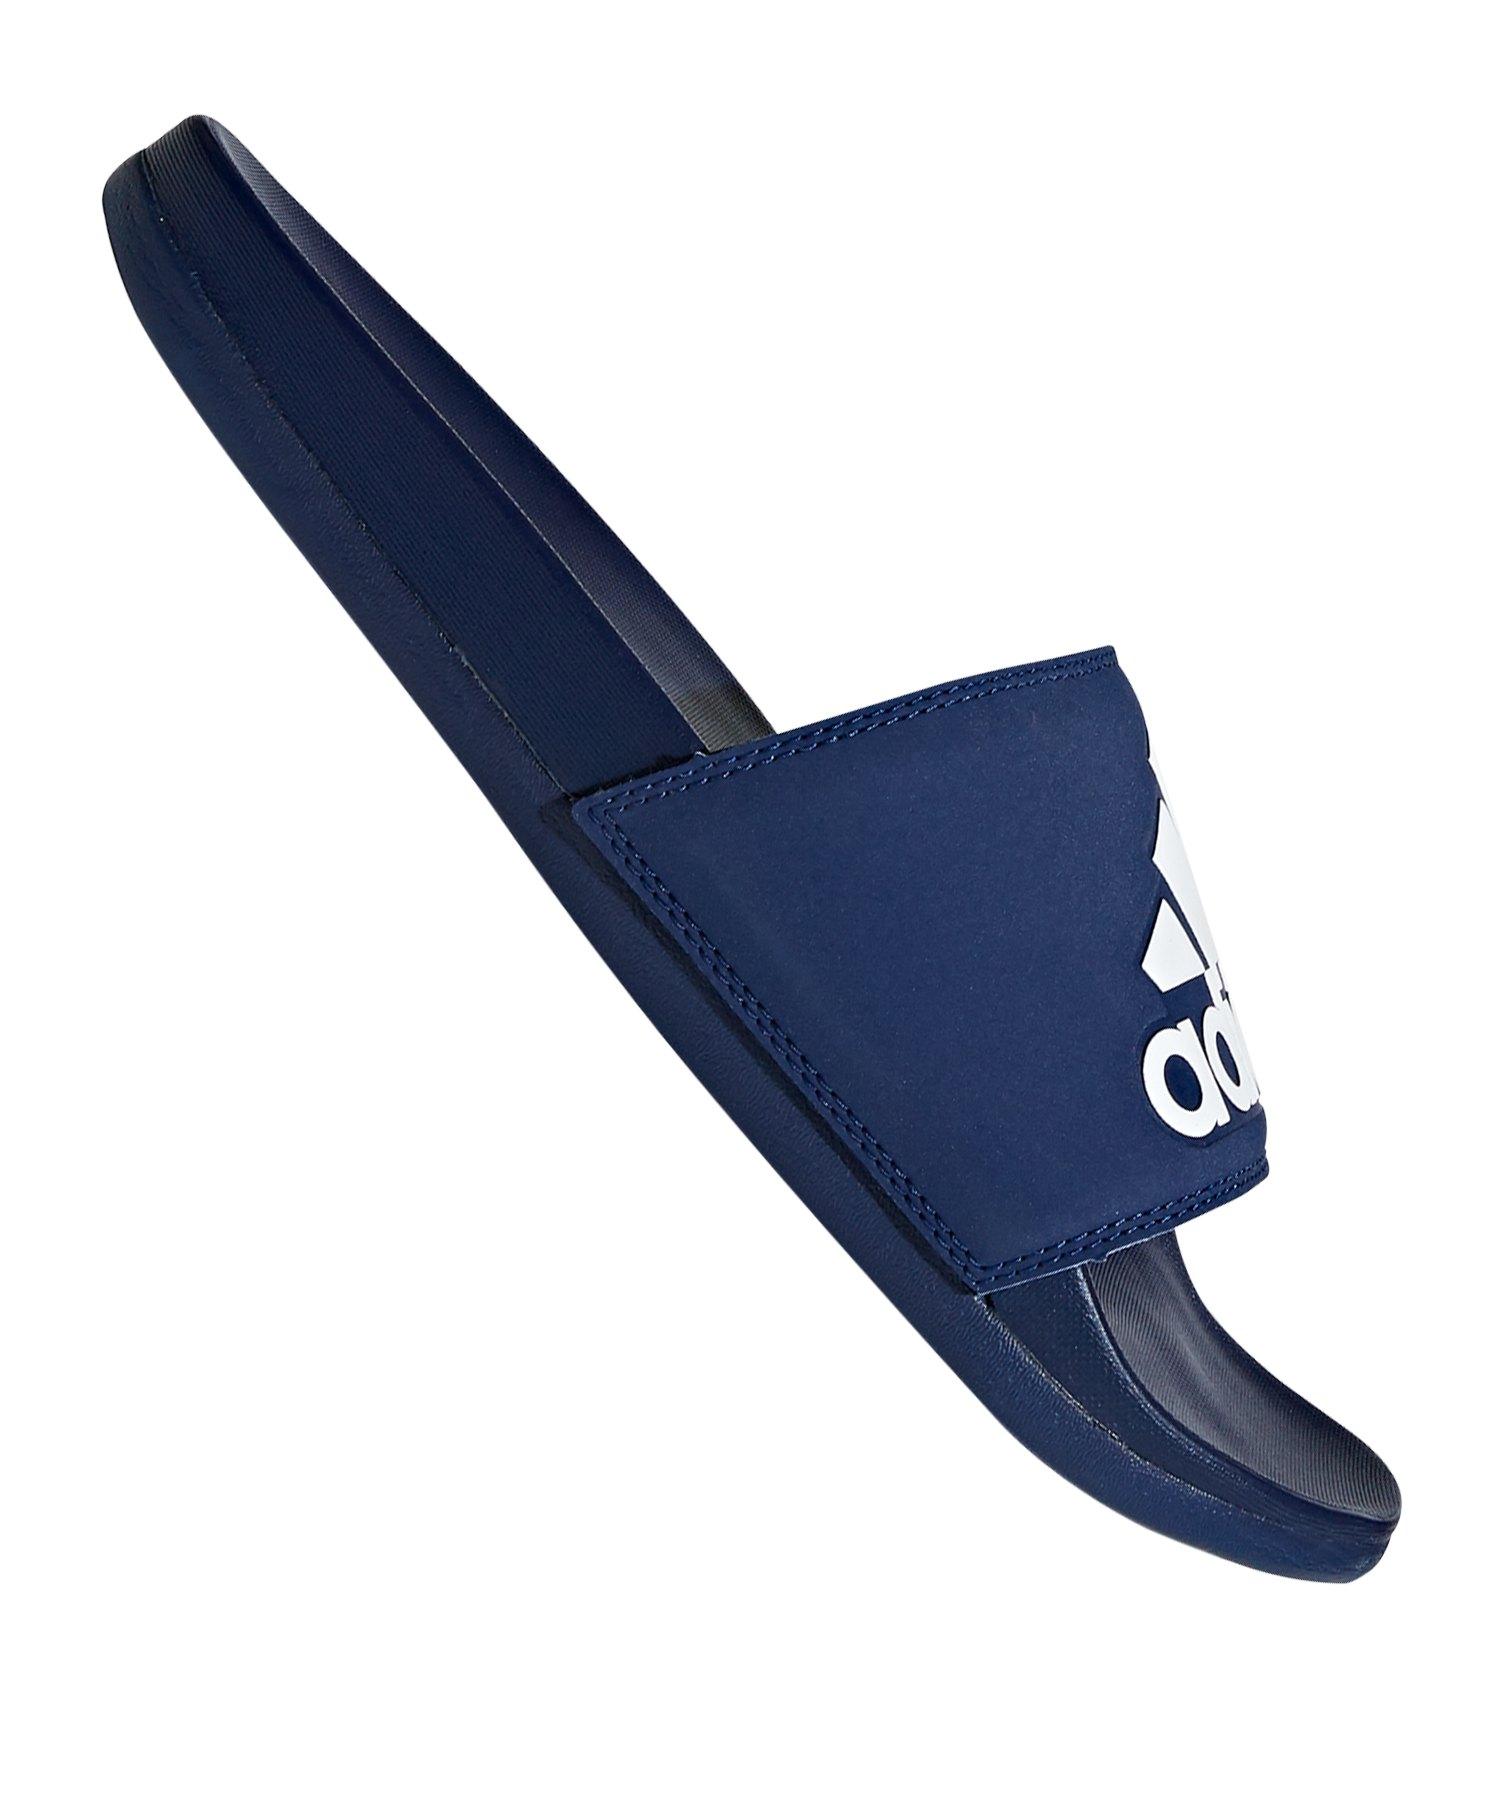 adidas Adilette Comfort Badelatsche Dunkelblau - blau